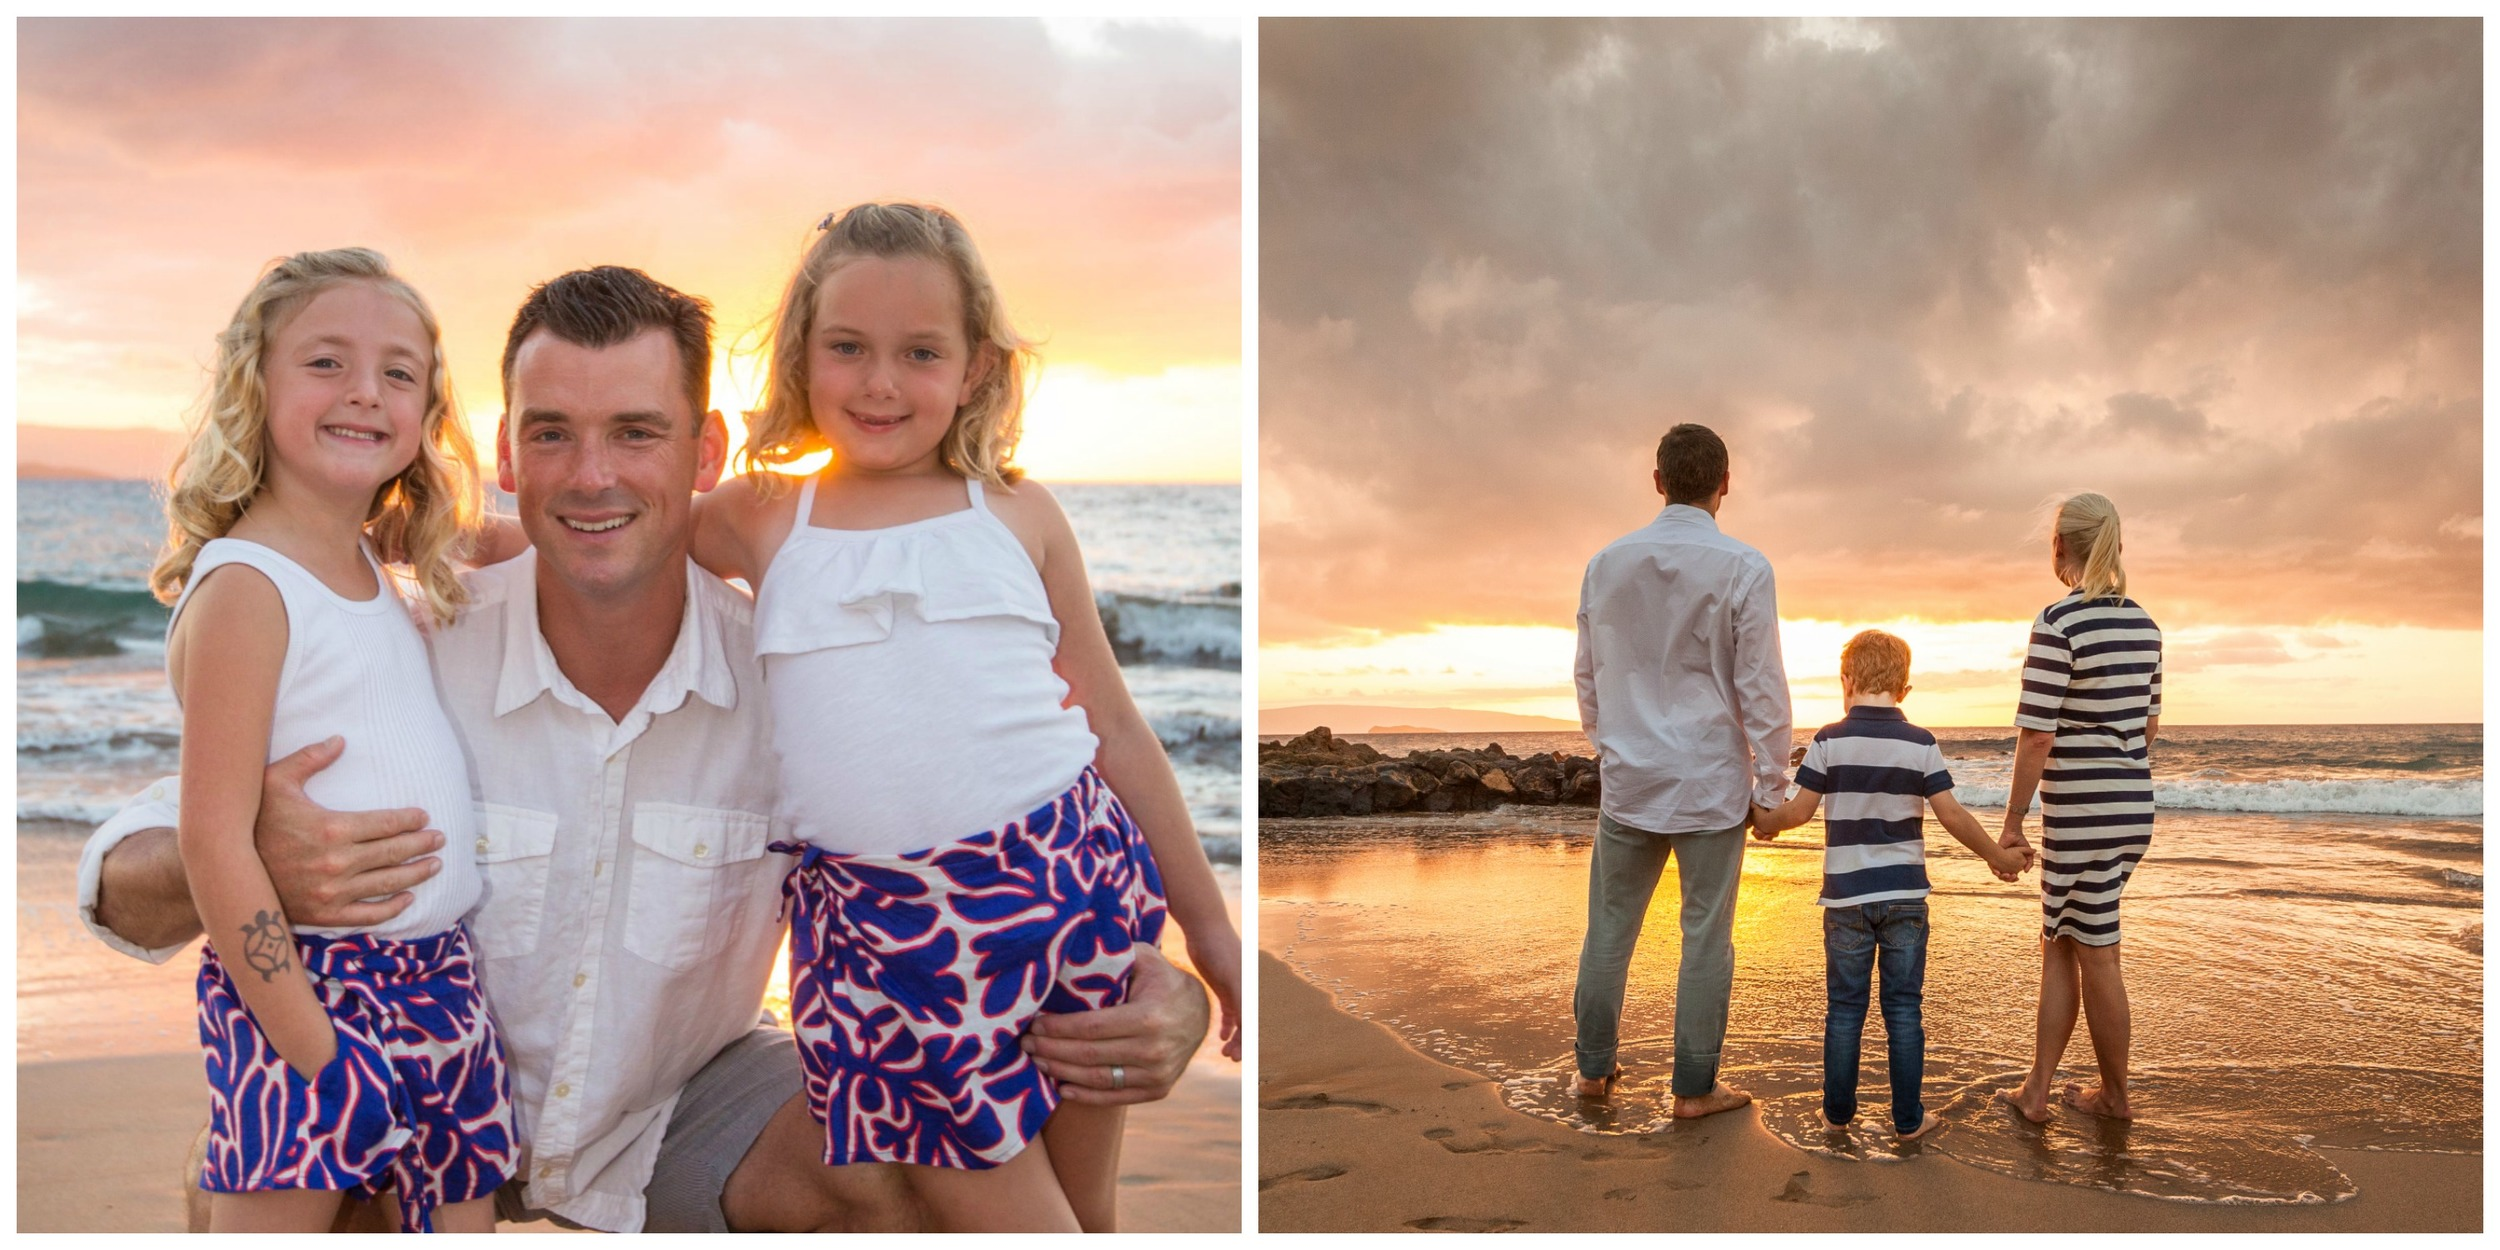 Pacific Dream Photography - Hawaii Photographer - Portrait Photographer - Family Photographer- Maui Photographer - Maui Beach Photos 1